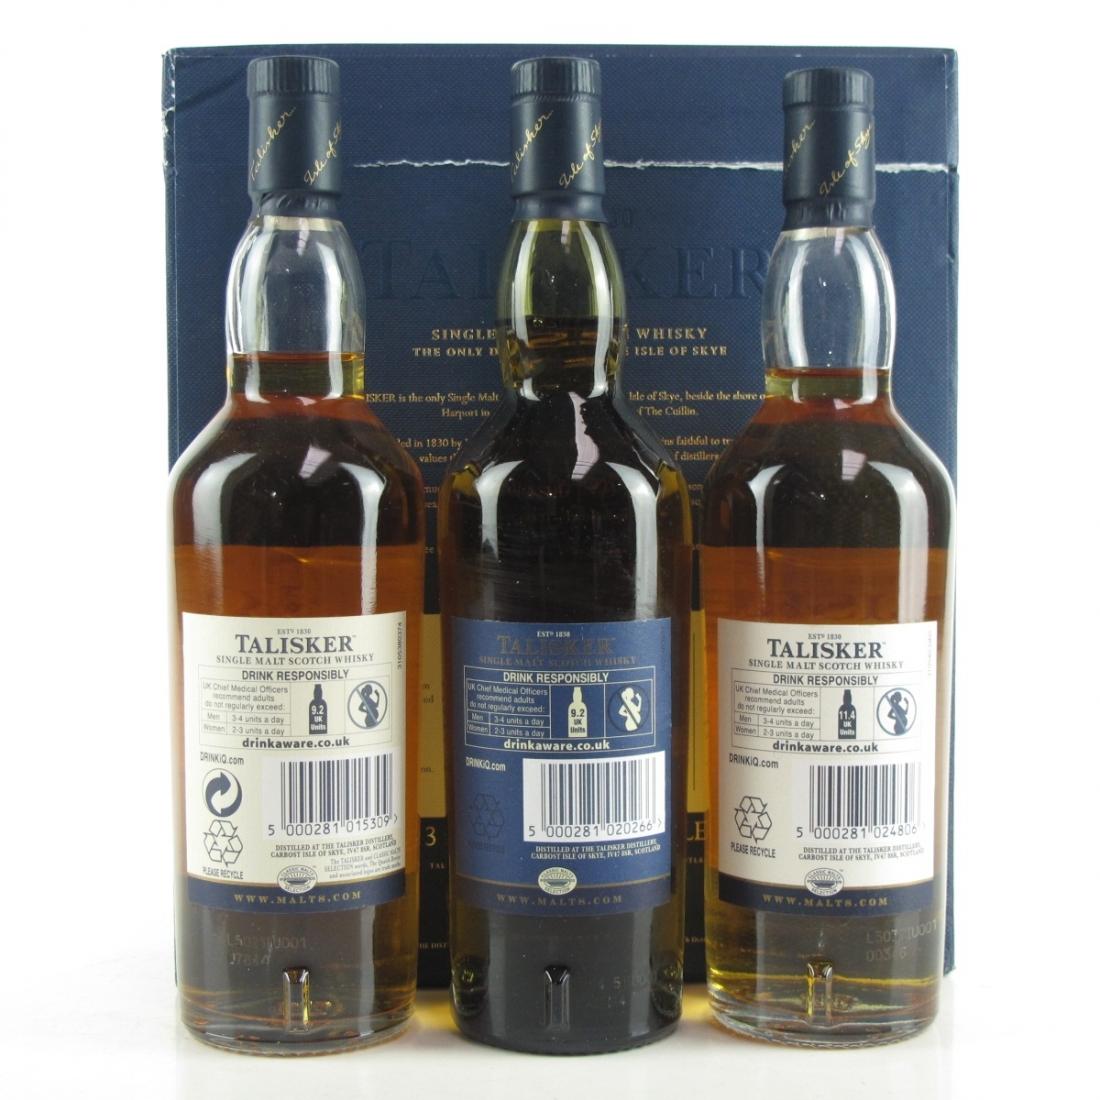 Talisker Gift Pack 3 x 20cl / Including Distillers 2003 Edition